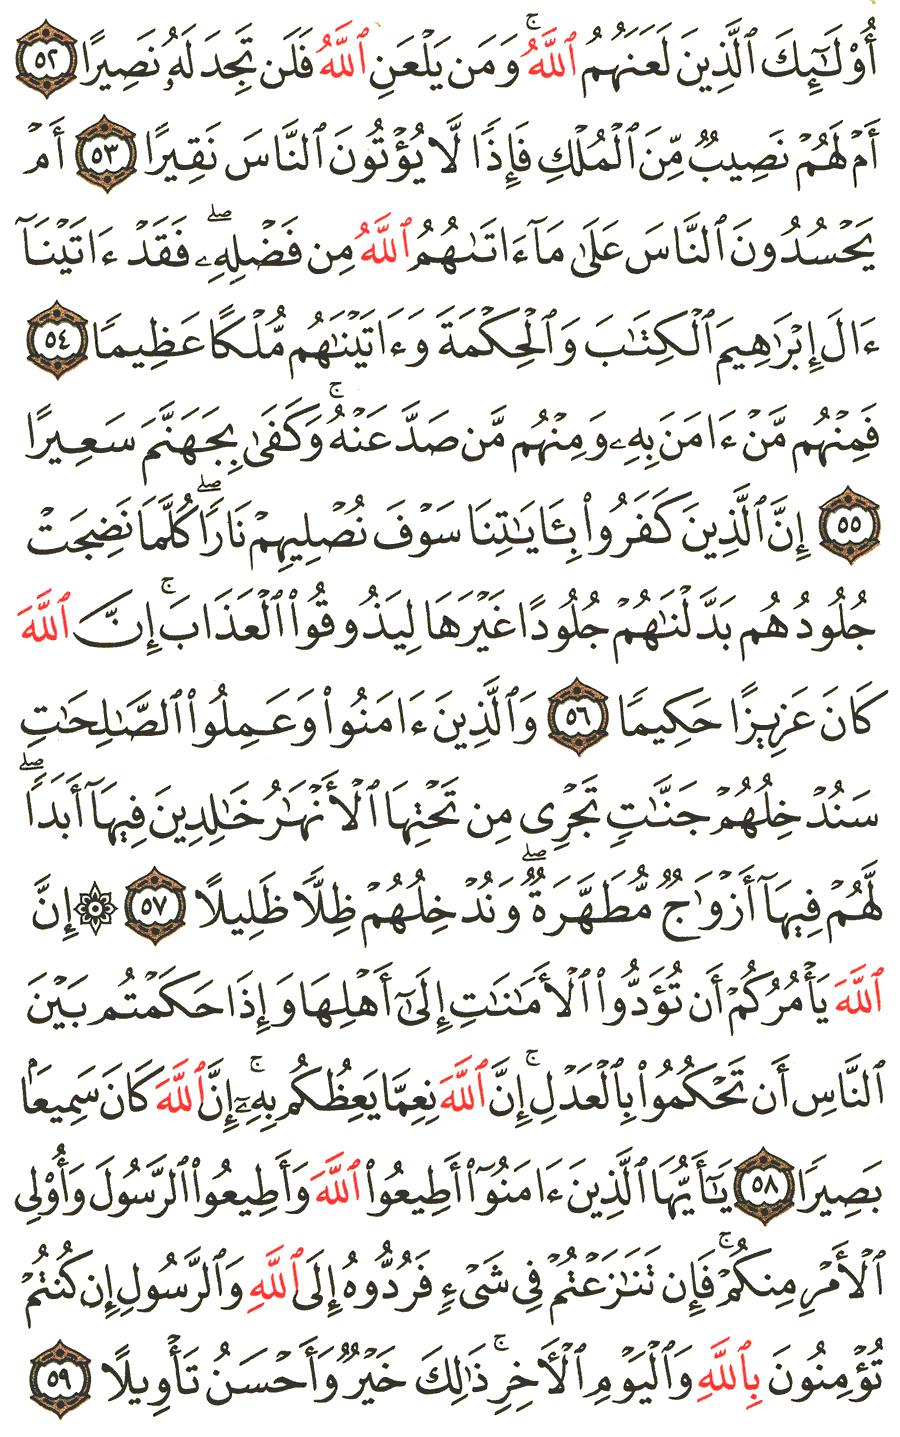 Surah An-nisa Ayat 59 : surah, an-nisa, Surah, An-Nisa, English, Translation, Meaning